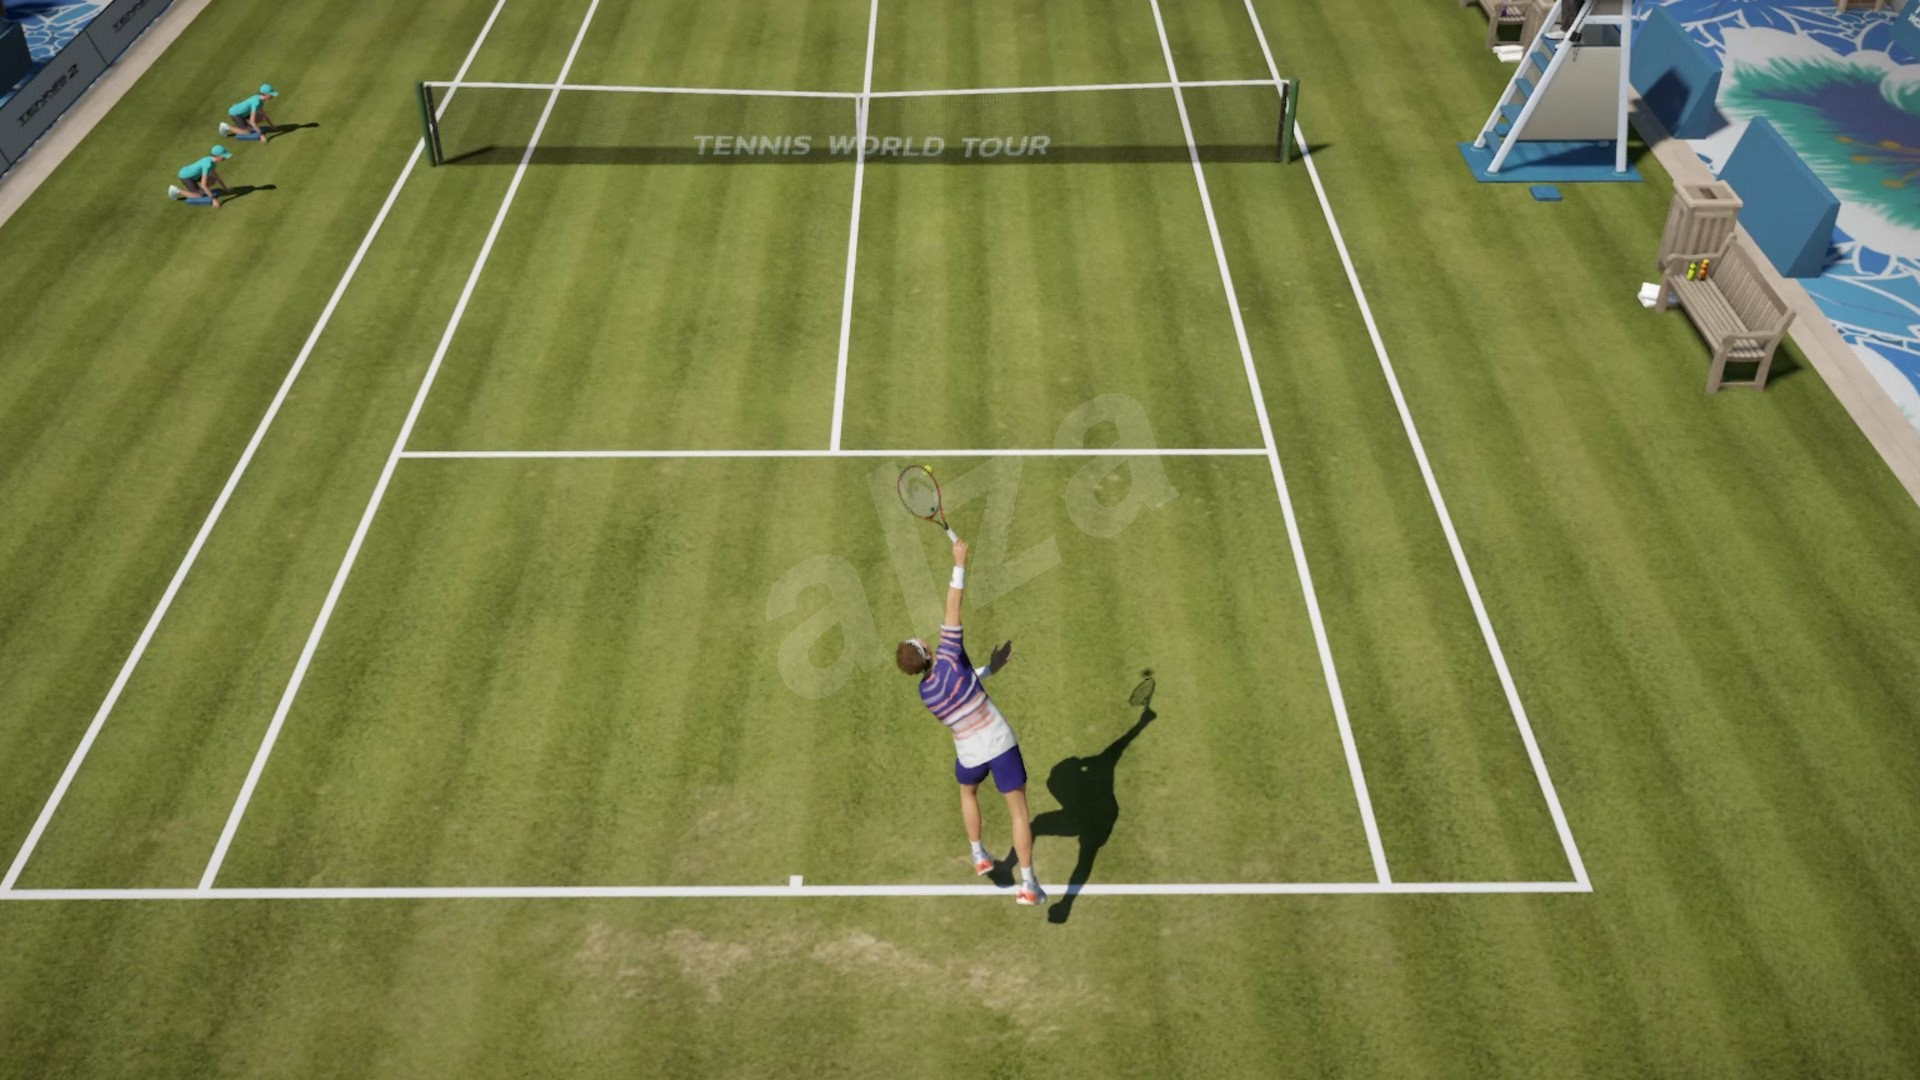 Tennis World Tour 2 - PS4 - Konzol játék